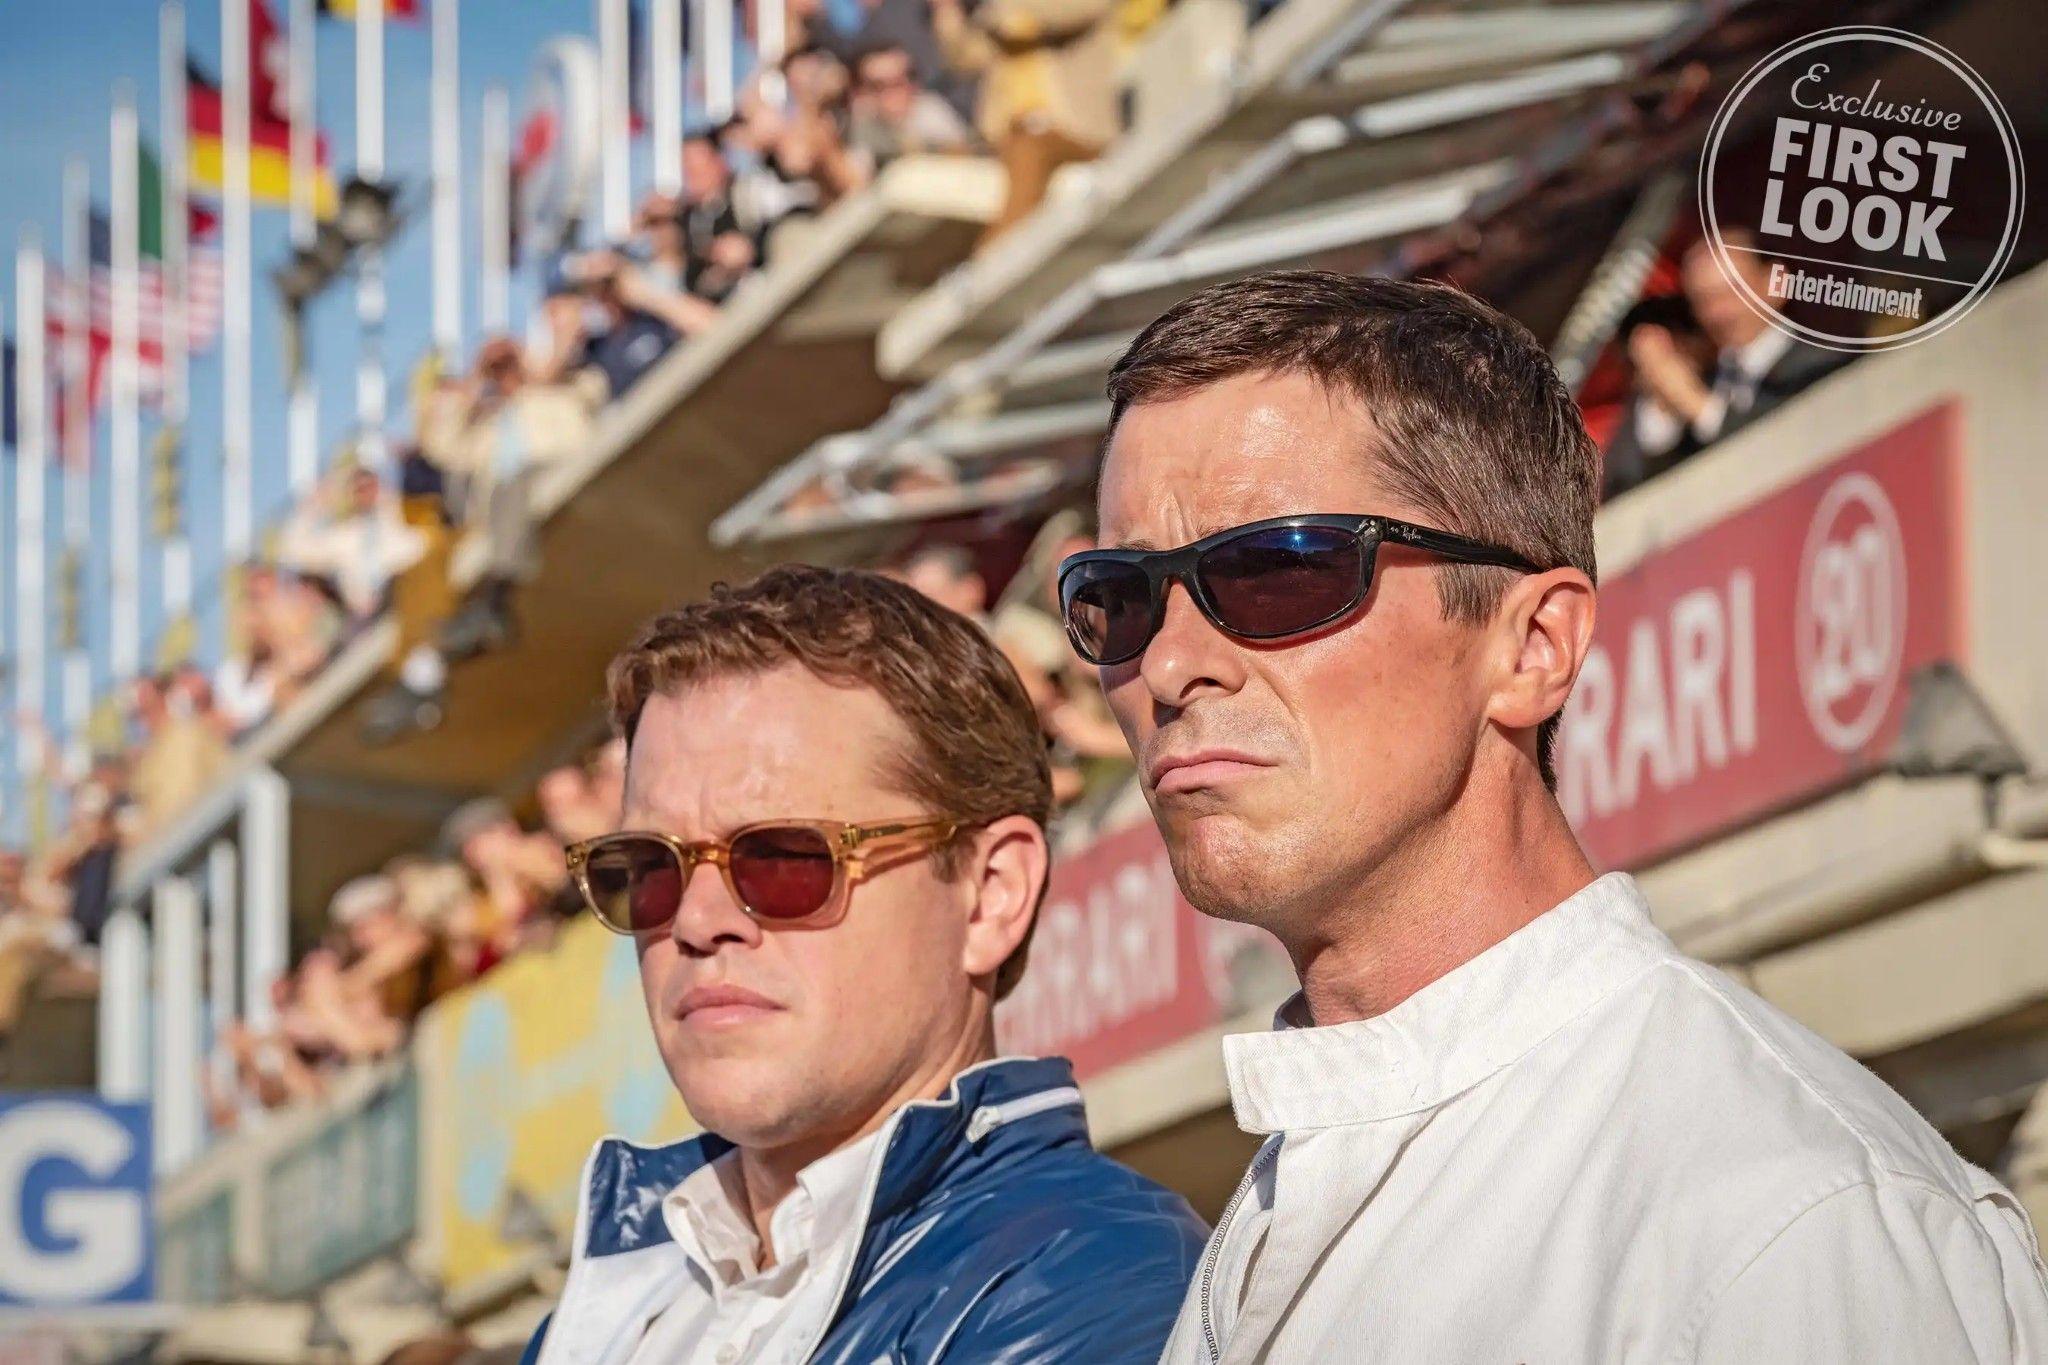 Elton John And Liam Gallagher Of Ford Vs Ferrari Christian Bale